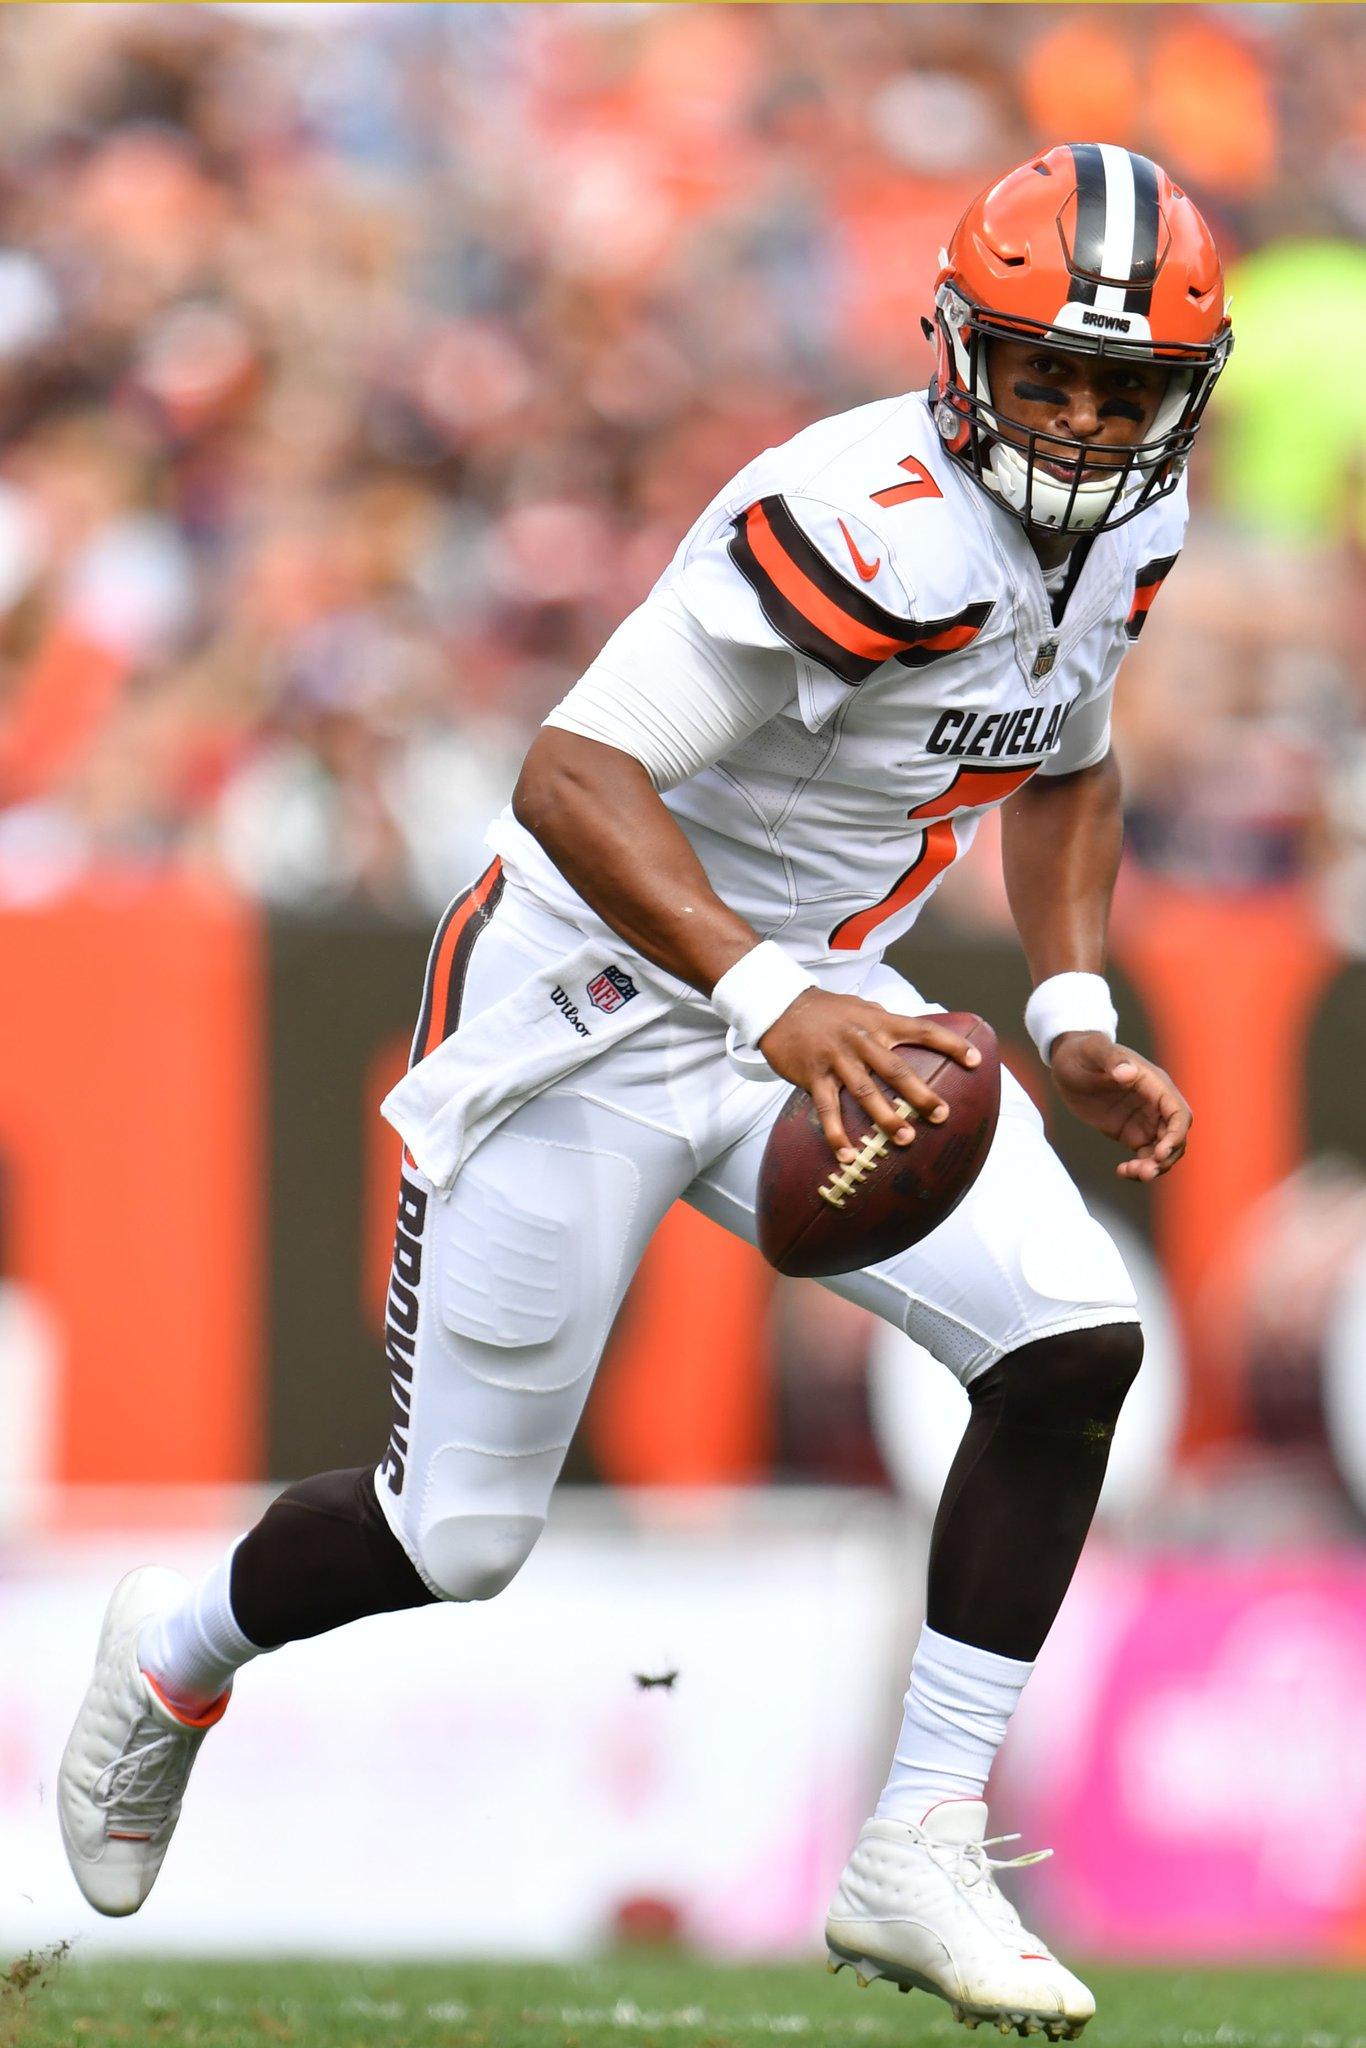 The Browns have benched rookie QB DeShone Kizer https://t.co/MwyuAn9ajM